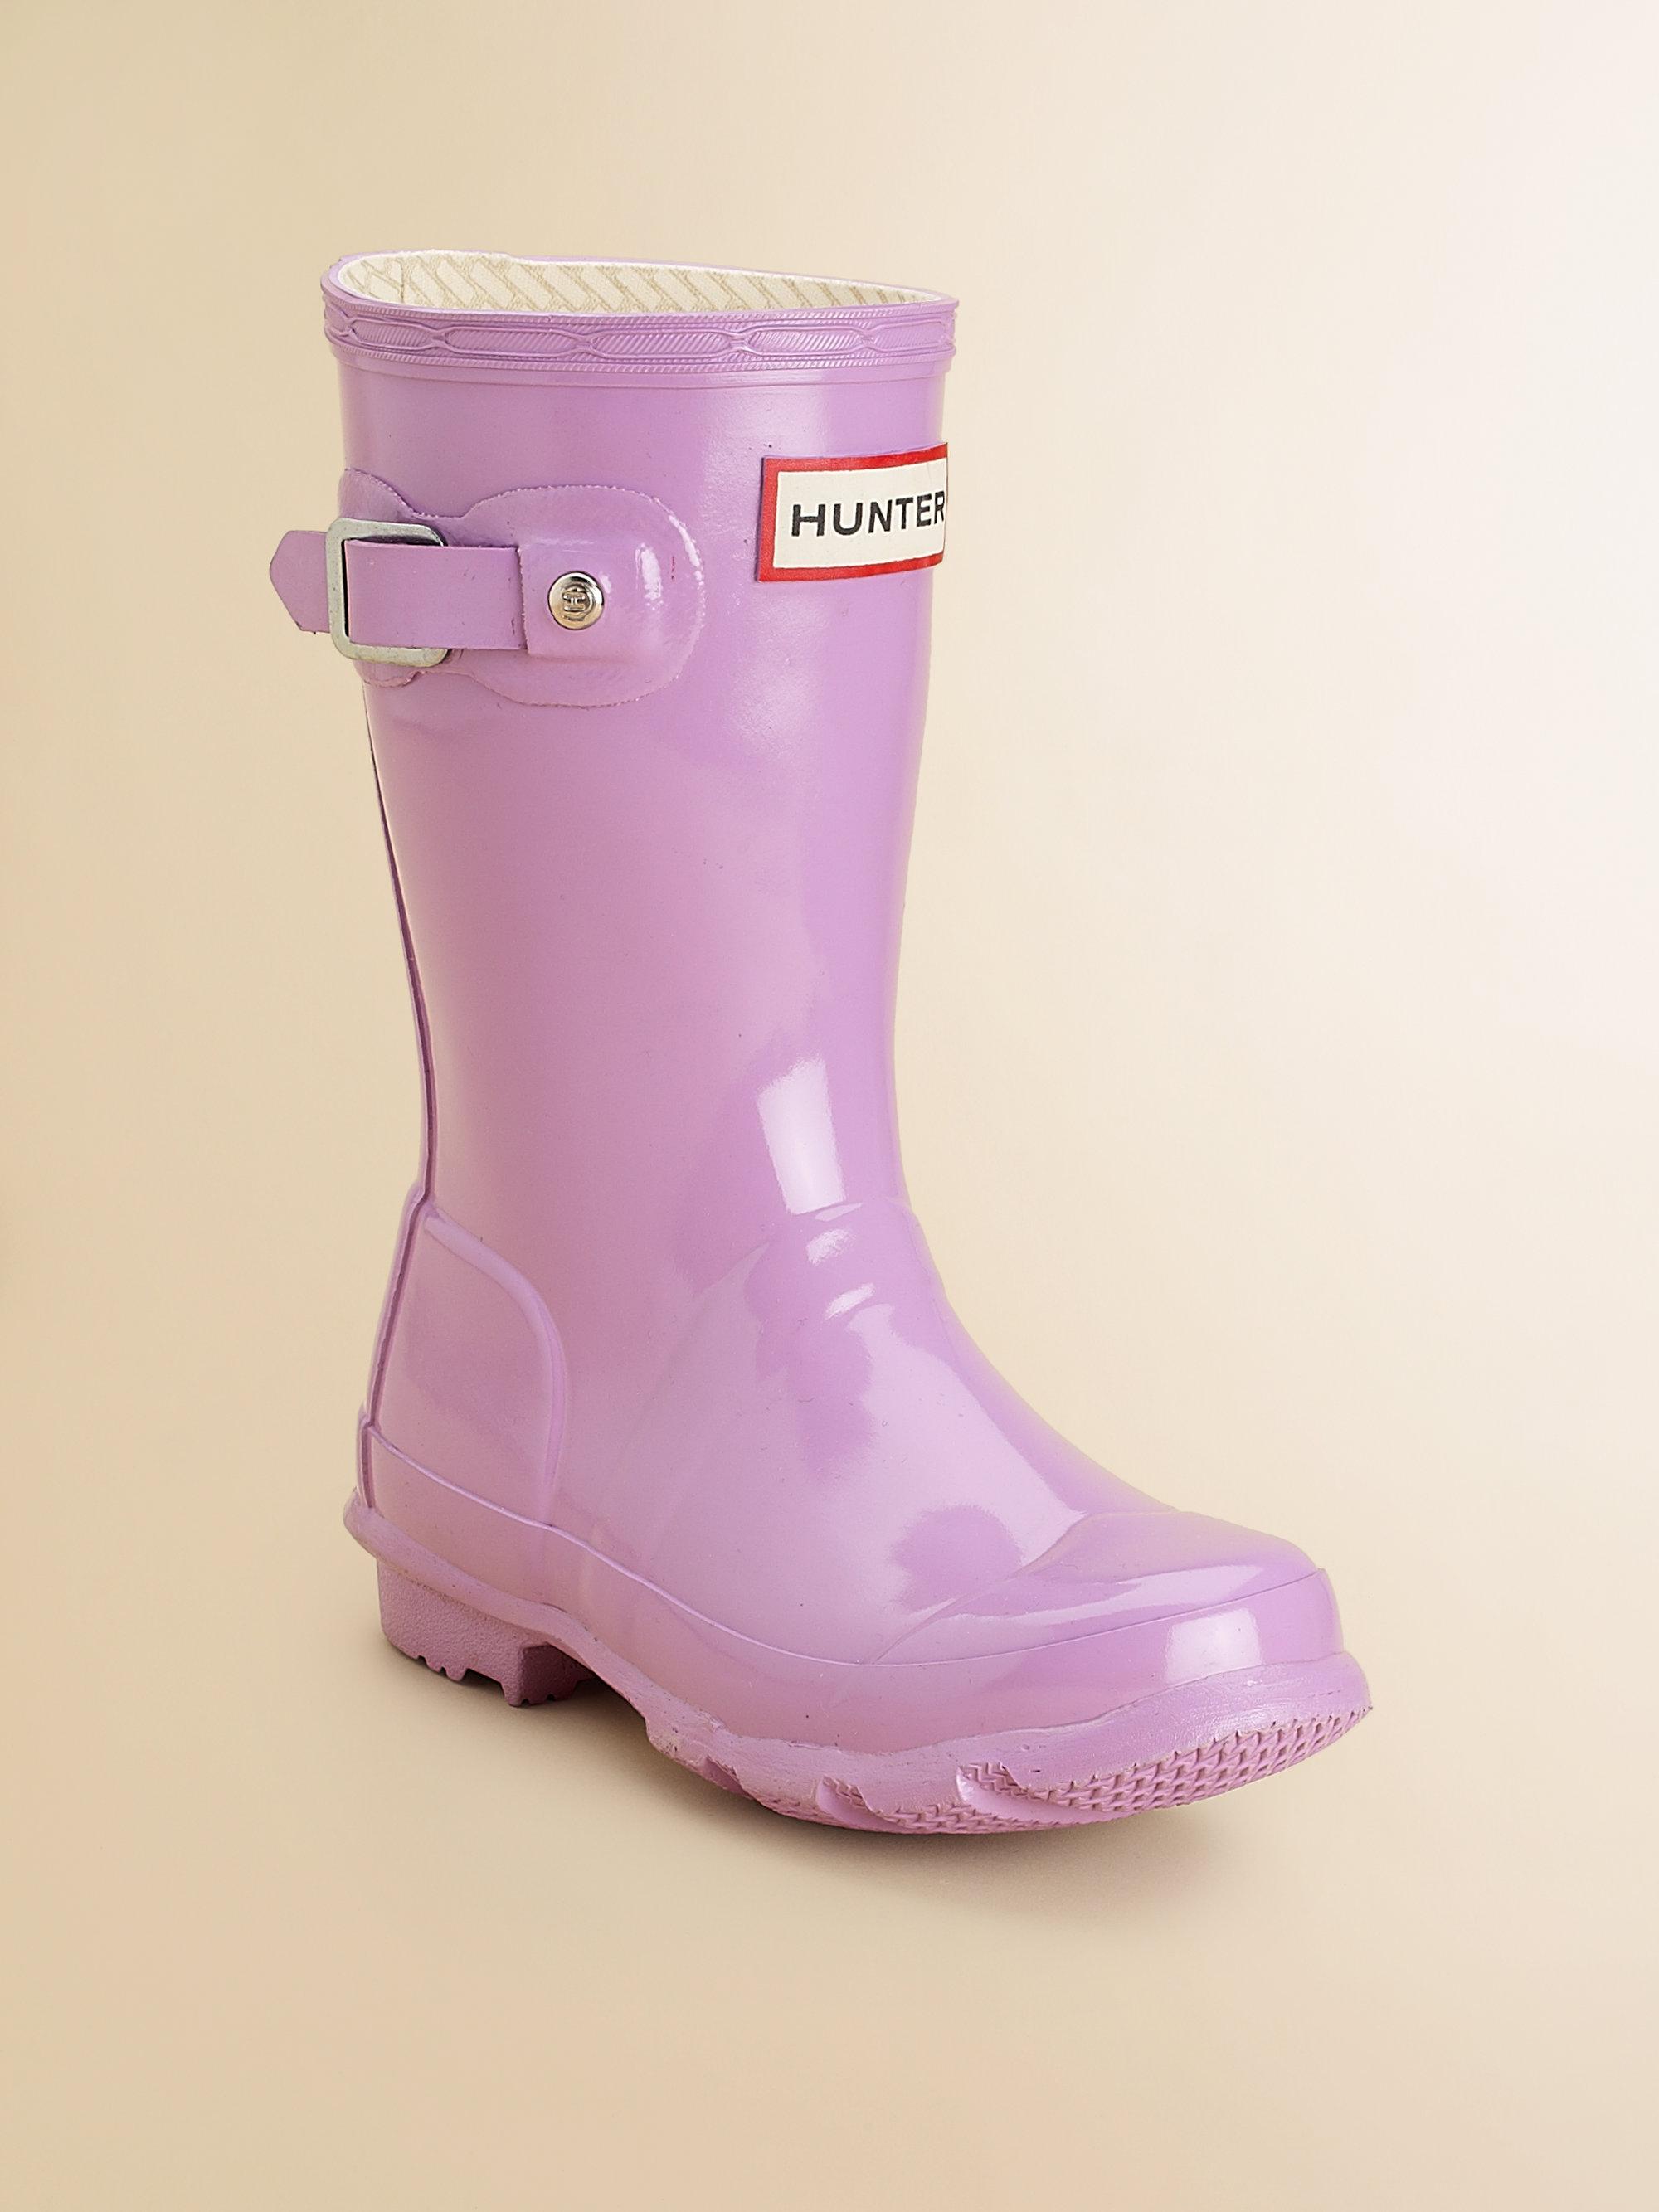 Hunter Kids High Gloss Original Tall Rain Boots in Pink | Lyst